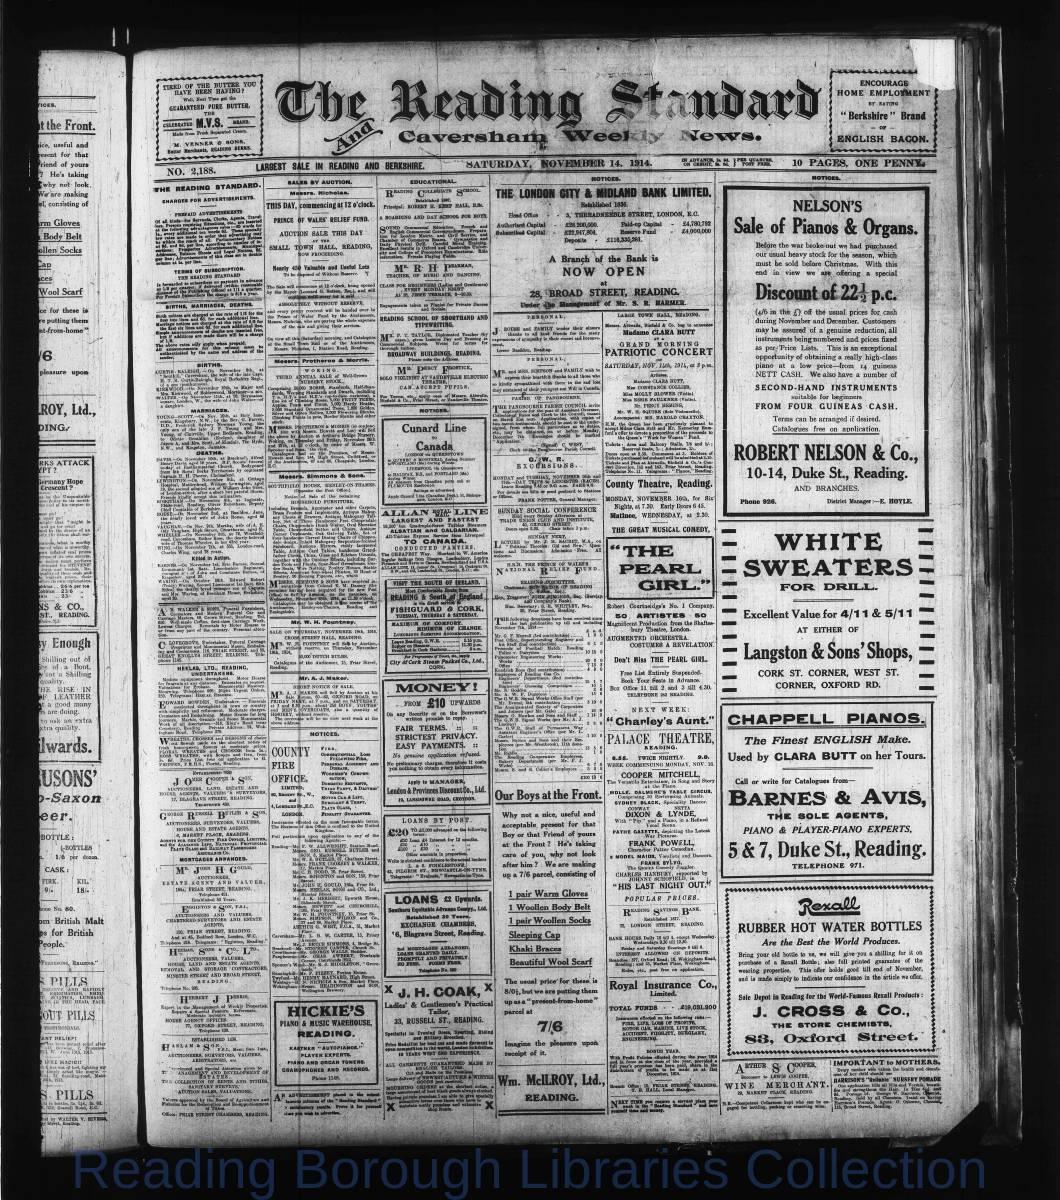 Reading Standard, Saturday, November 14,  1914. Pg 1